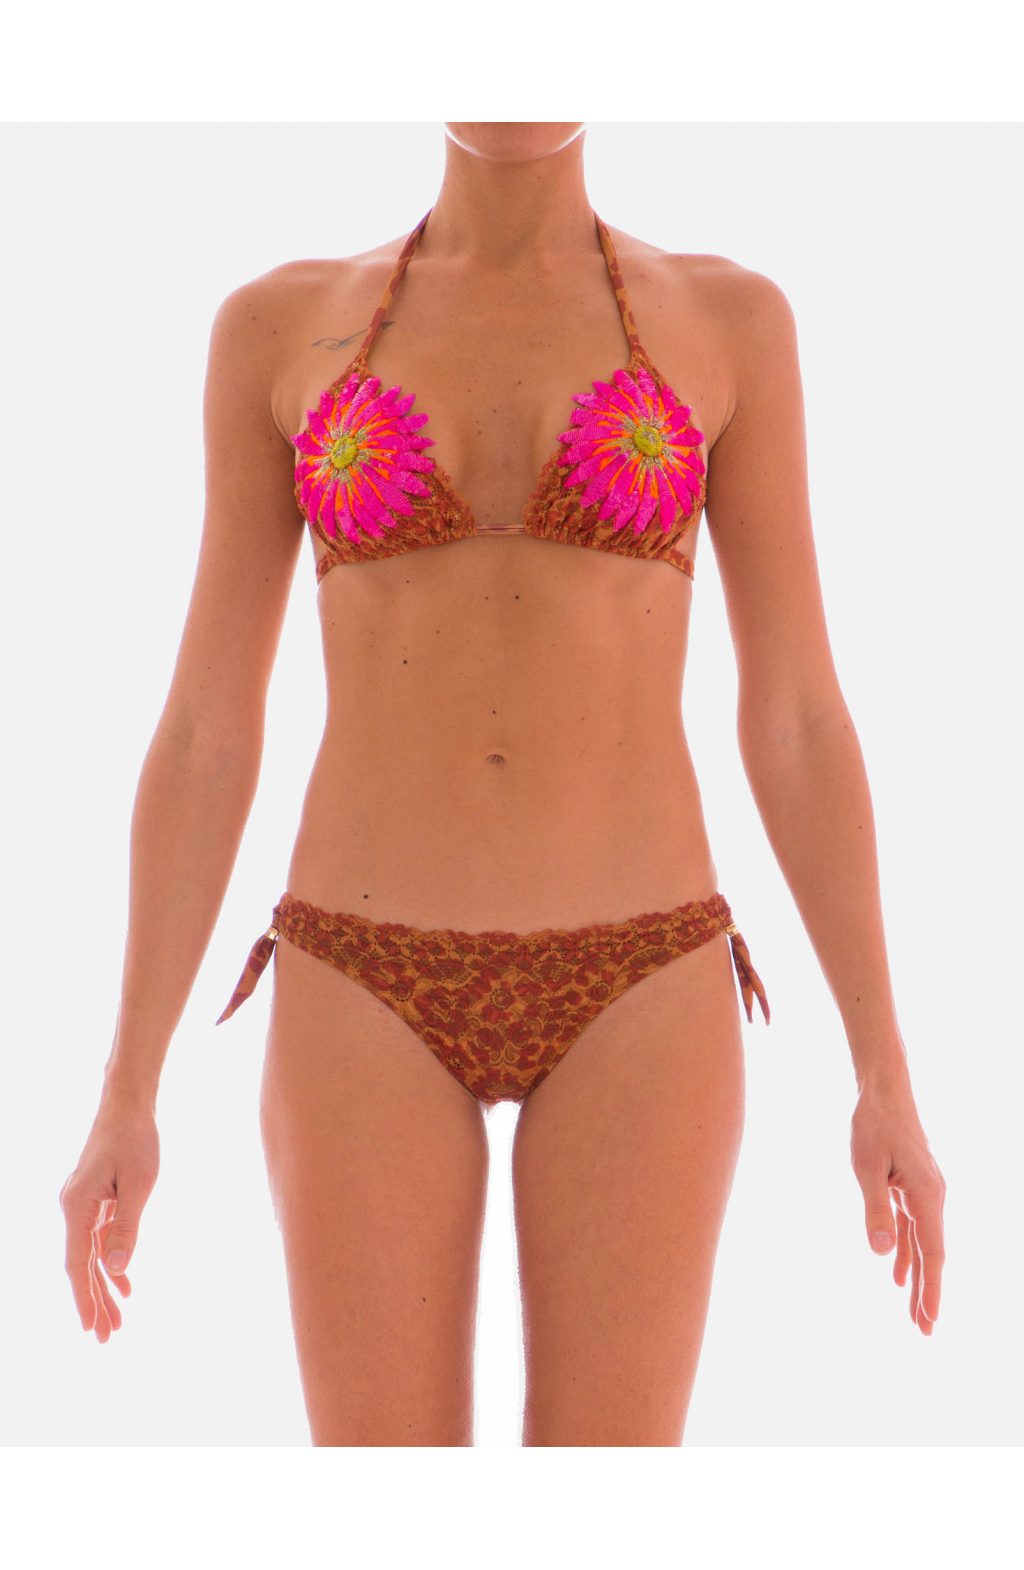 Bikini triangolo scorrevole Gerbera Fluo Animalier